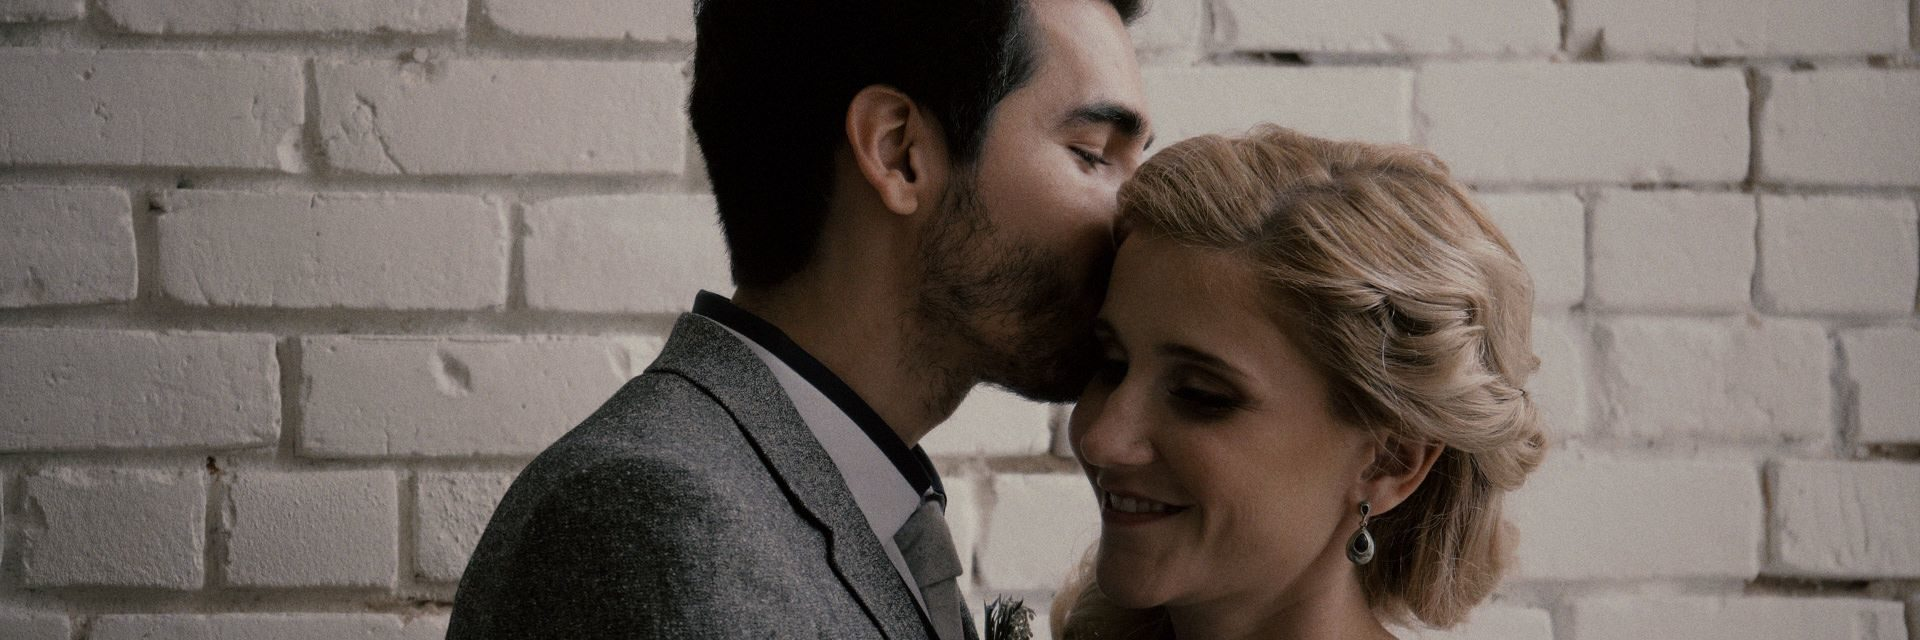 Seychelles-wedding-videographer-cinemate-films-03